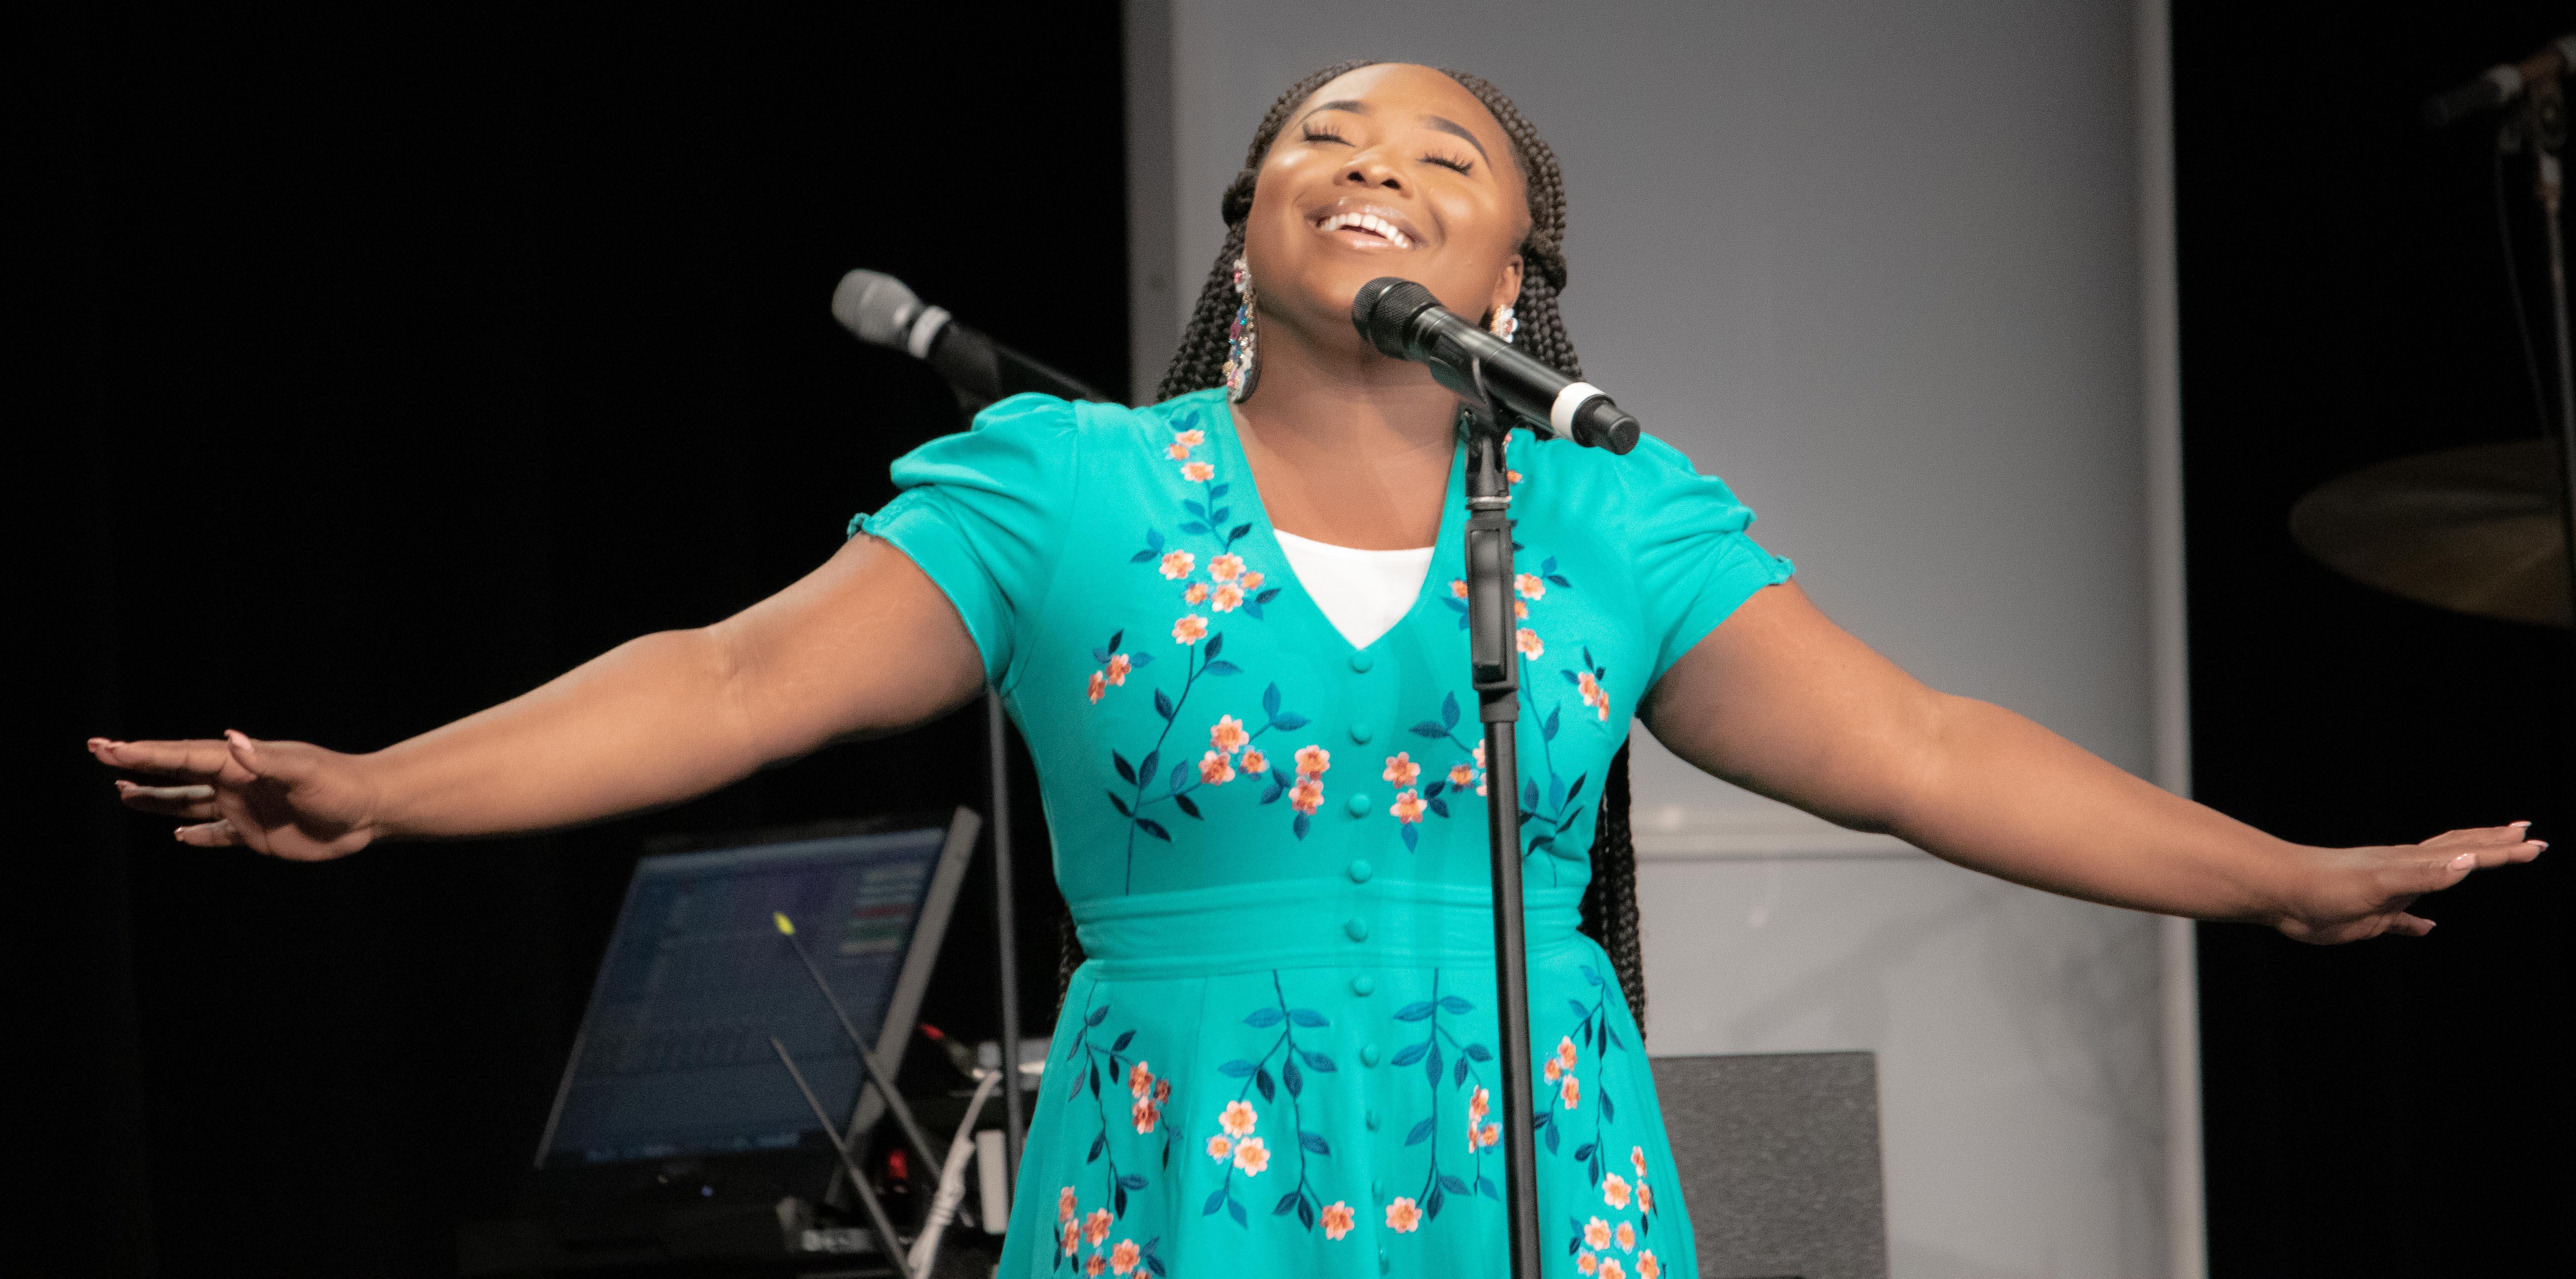 Jekalyn Carr performs